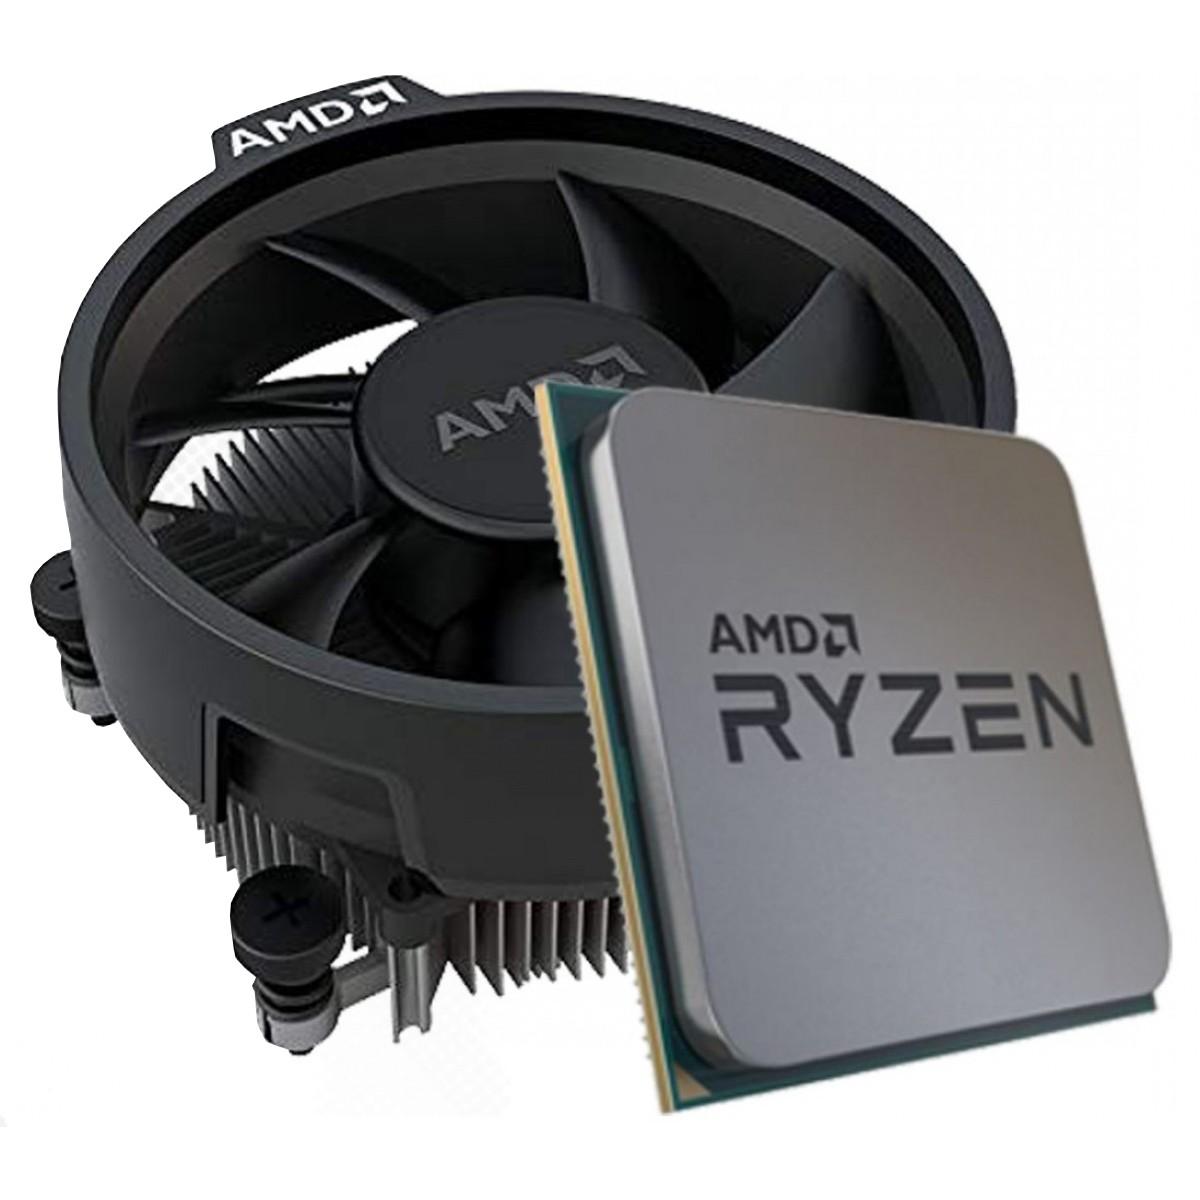 Kit Upgrade Biostar Radeon RX 550 4GB + AMD Ryzen 5 3500 + Biostar A320MH + Memória DDR4 16GB (2x8GB) 3000Mhz